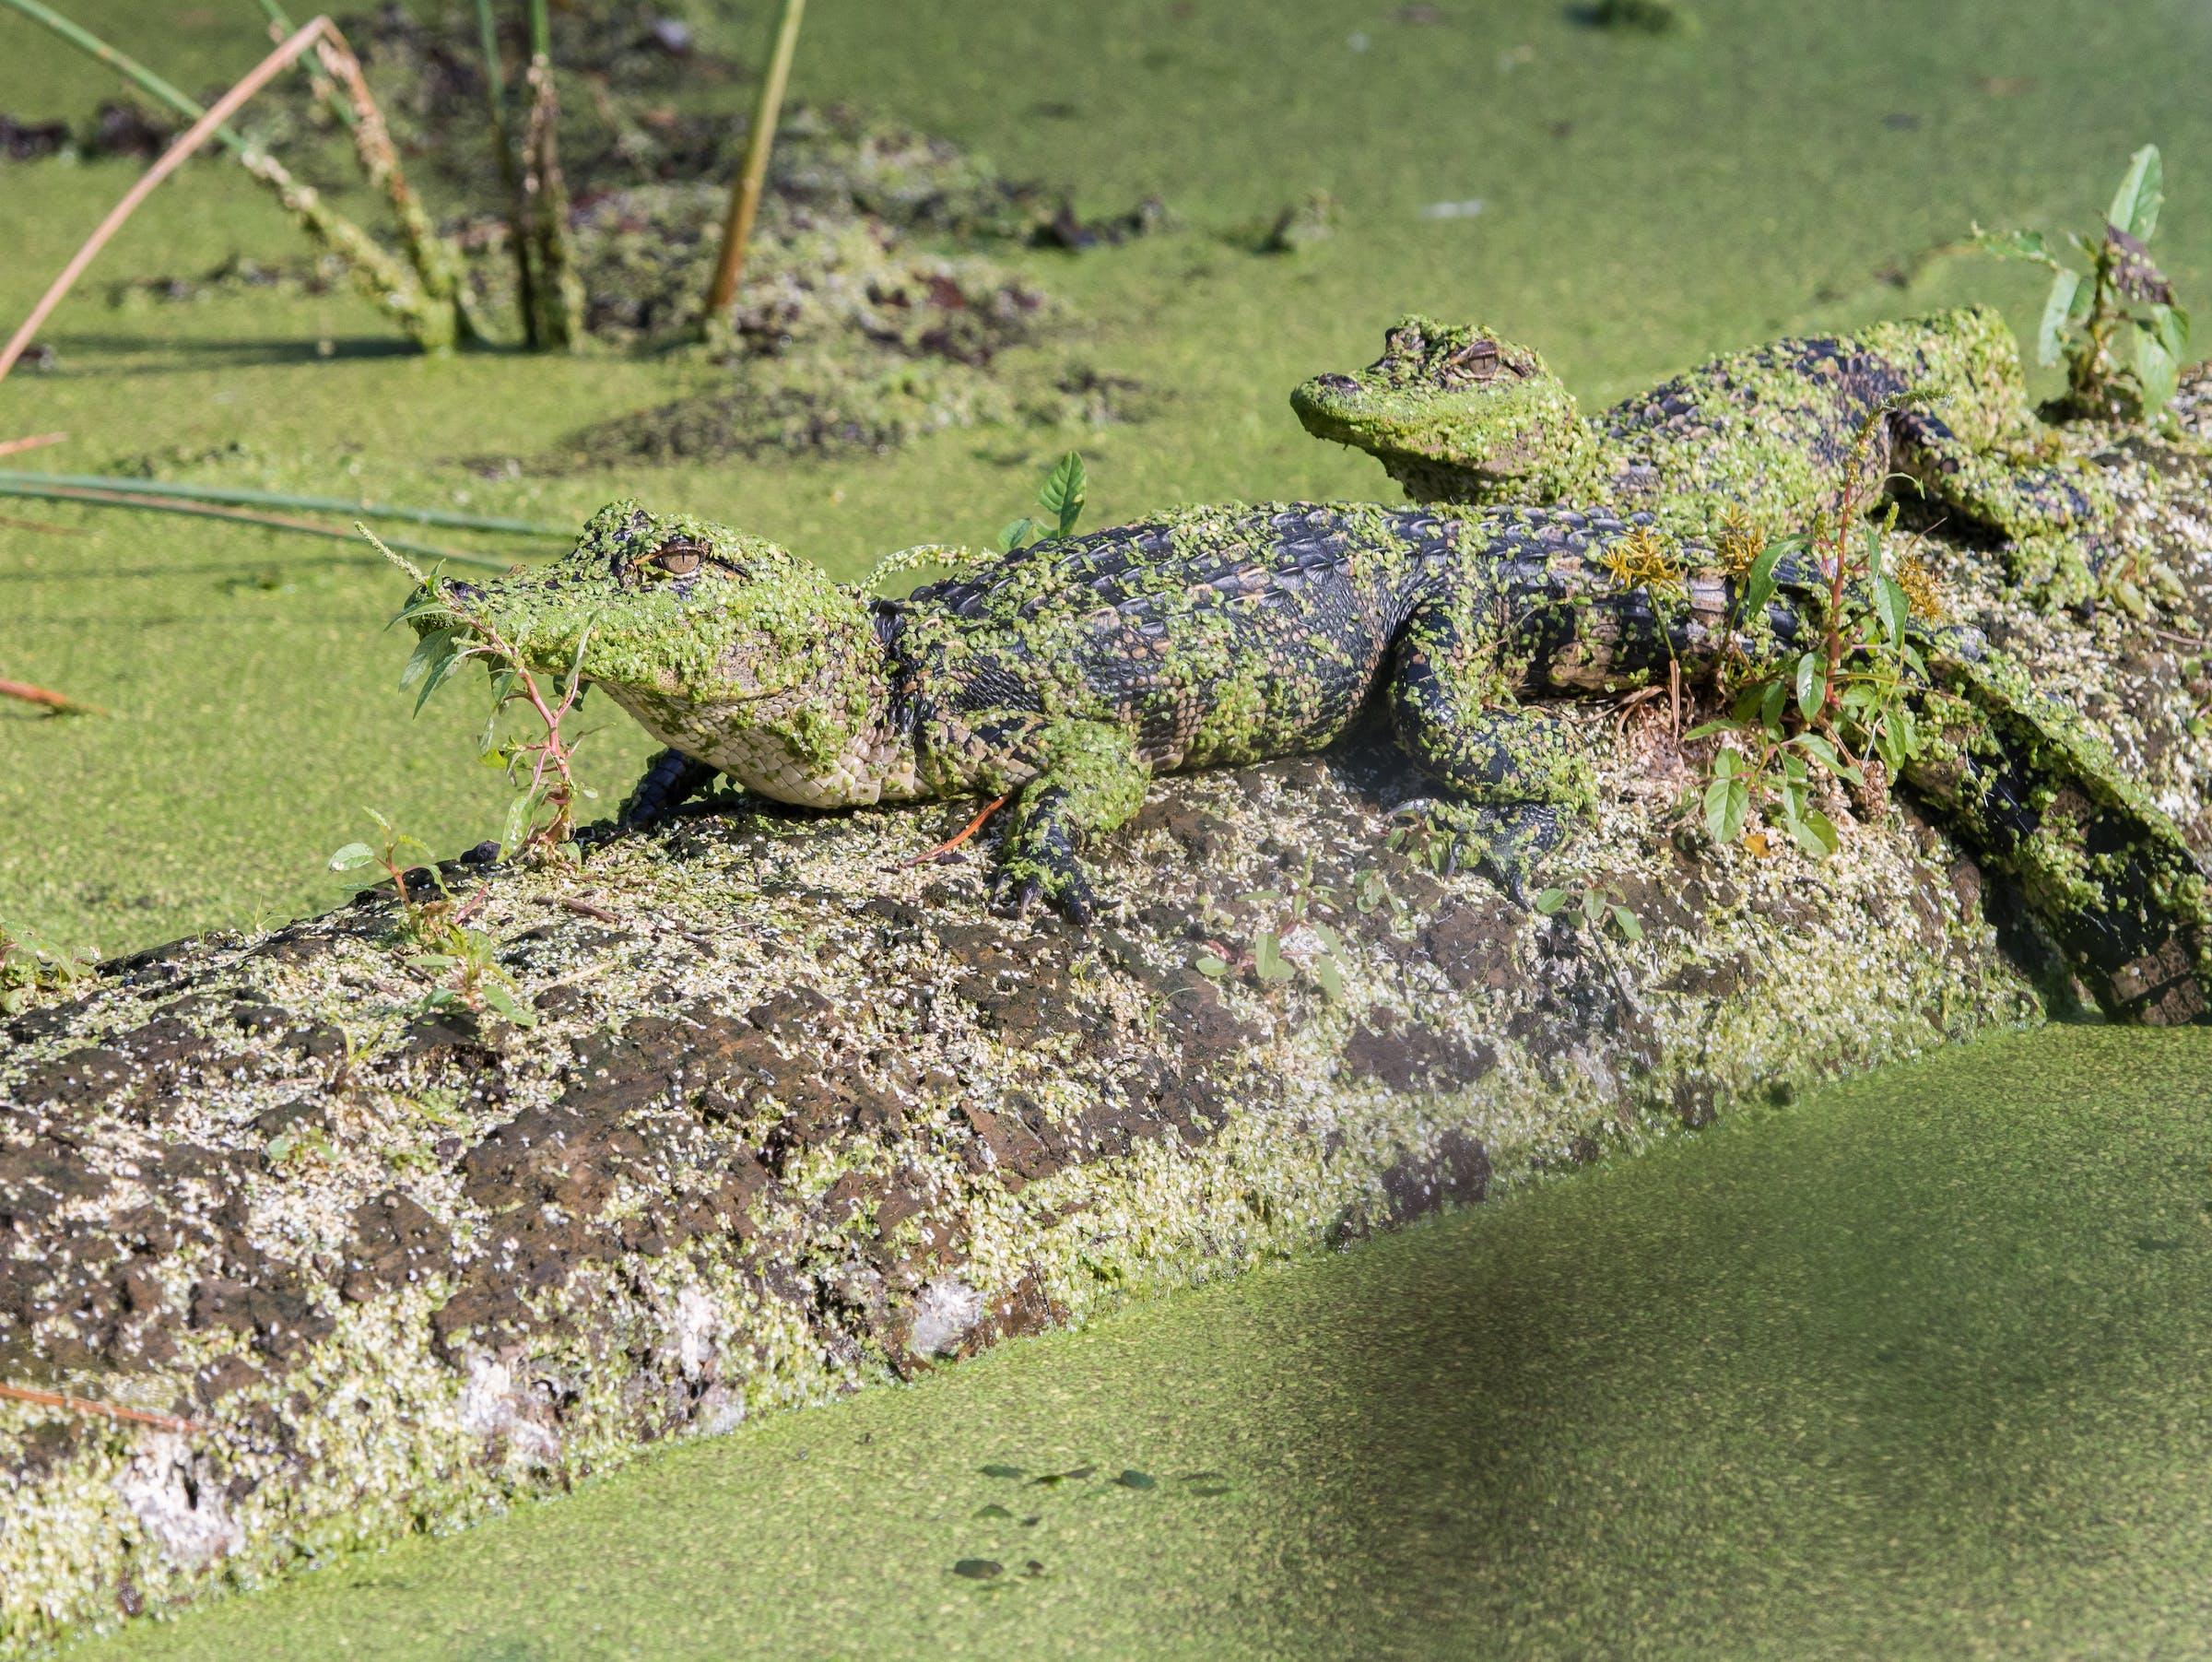 Juvenile American Alligators (Alligator mississippiensis)